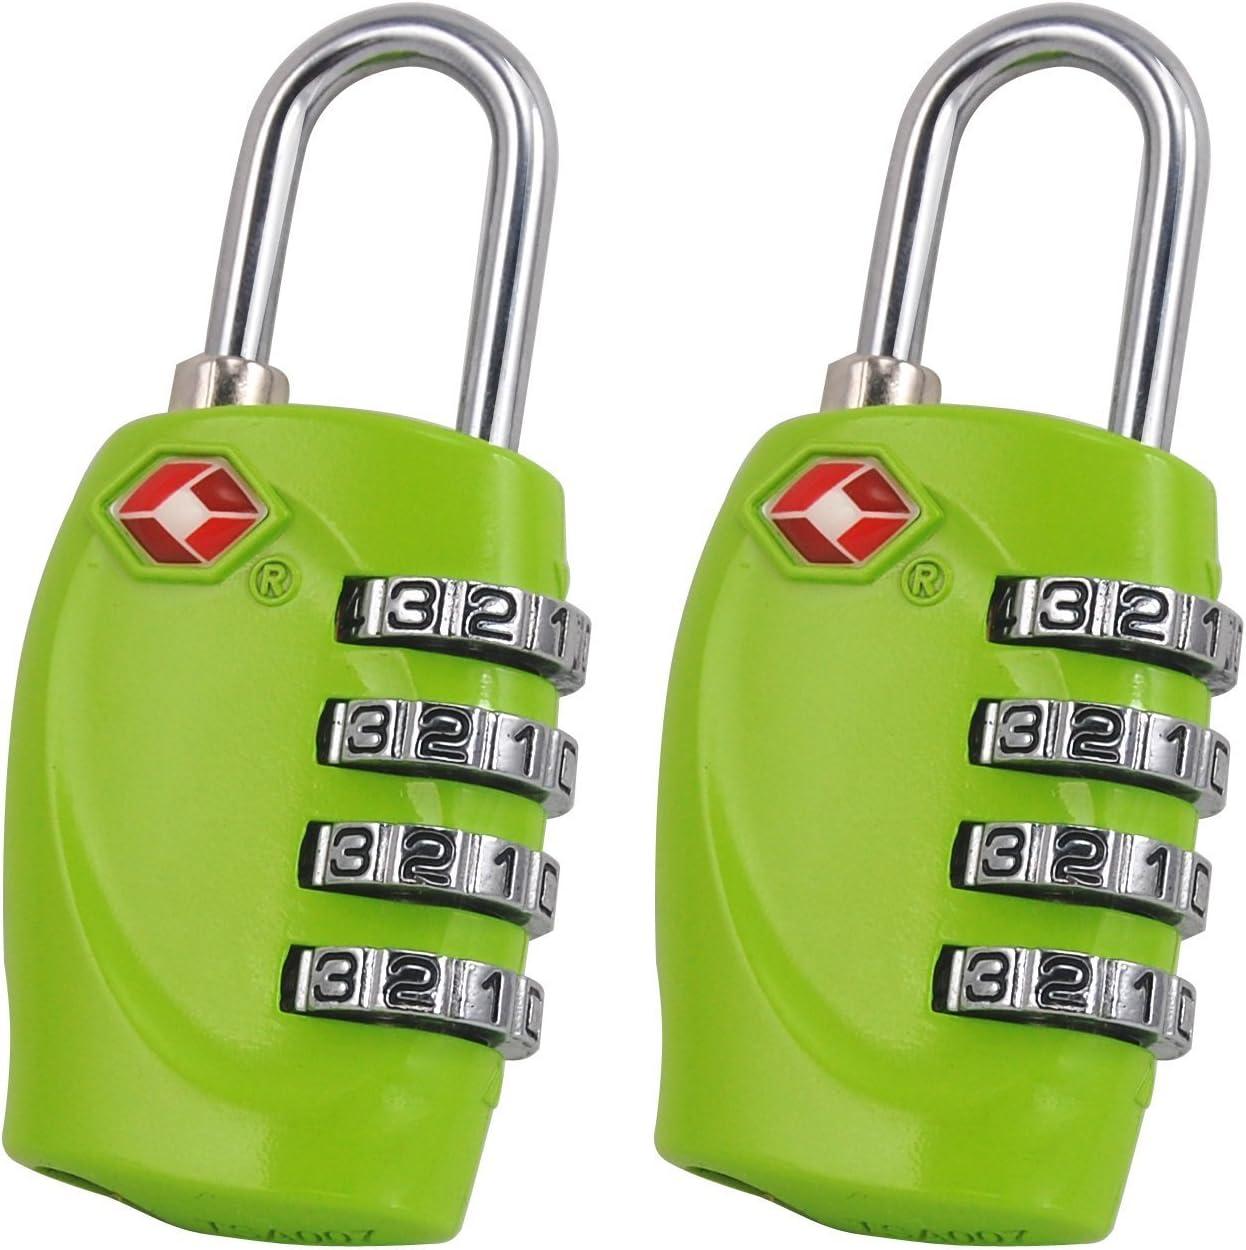 Black, 2 Pack E-db Combination Lock 4 Digit Combination Lock Combination Password Padlock Travel Lock TSA Approved Travel Luggage Suitcase Lock Padlock